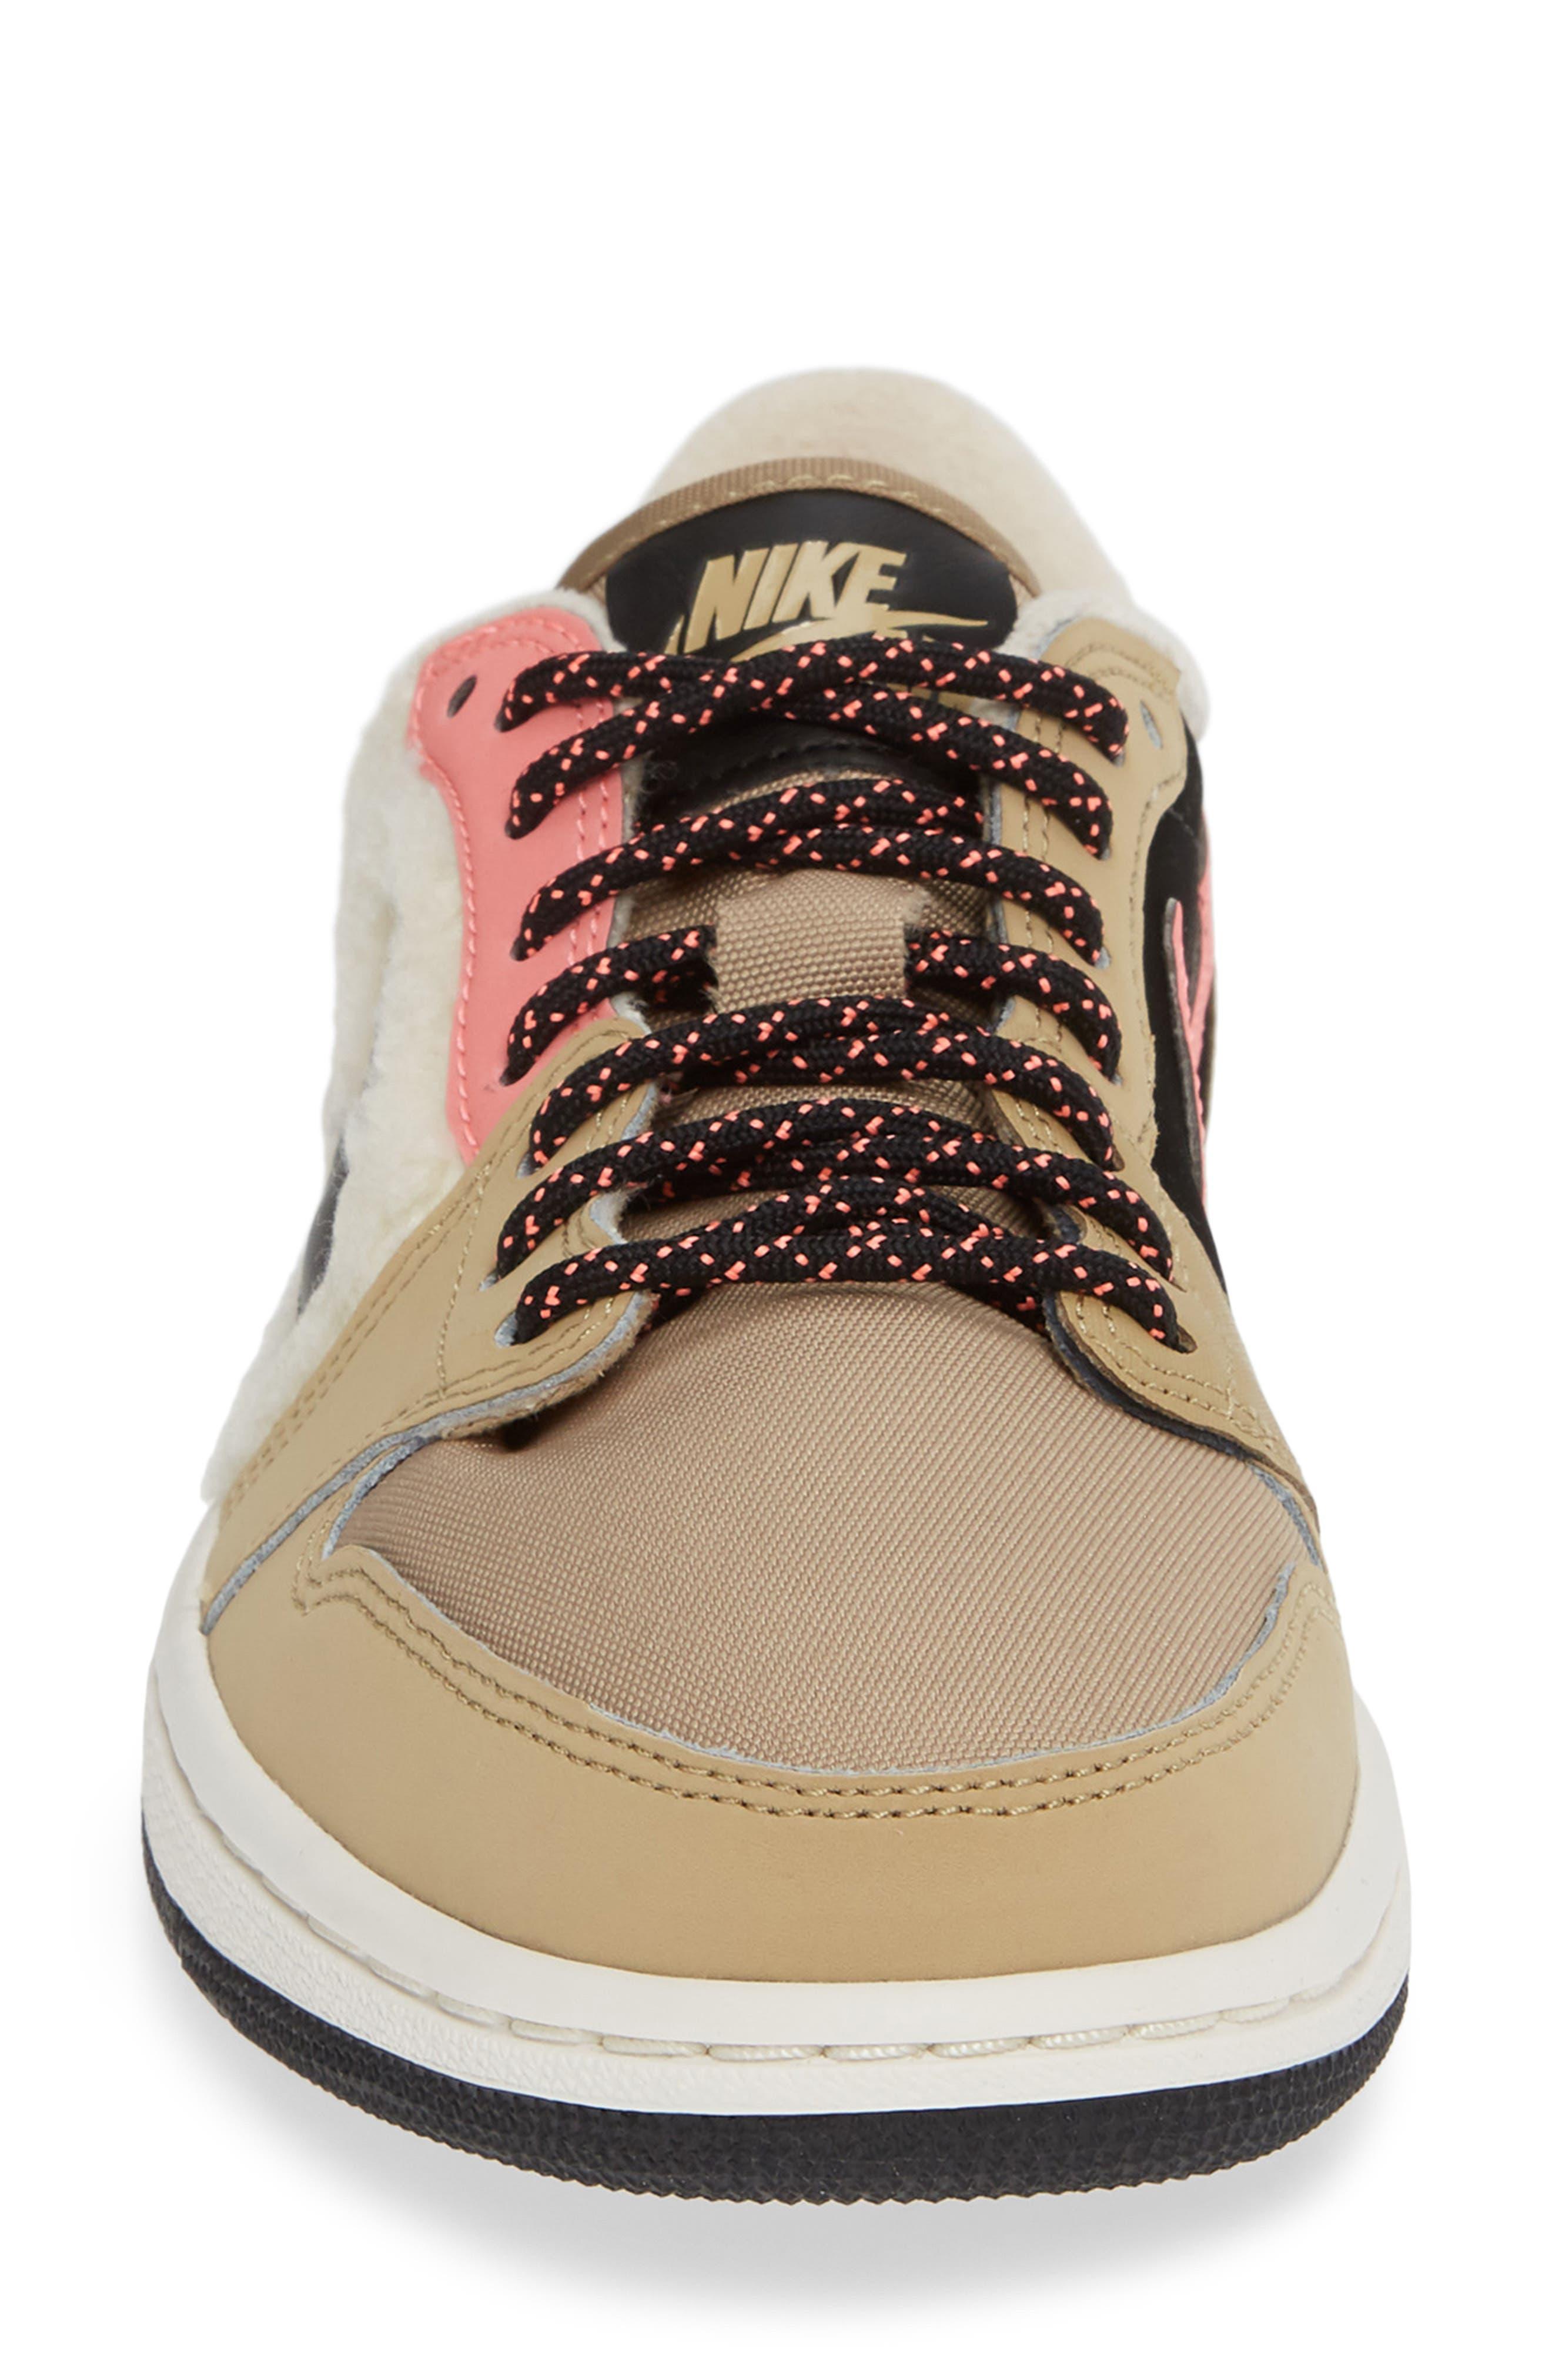 NIKE,                             Air Jordan 1 Retro Low OG Sneaker,                             Alternate thumbnail 4, color,                             200